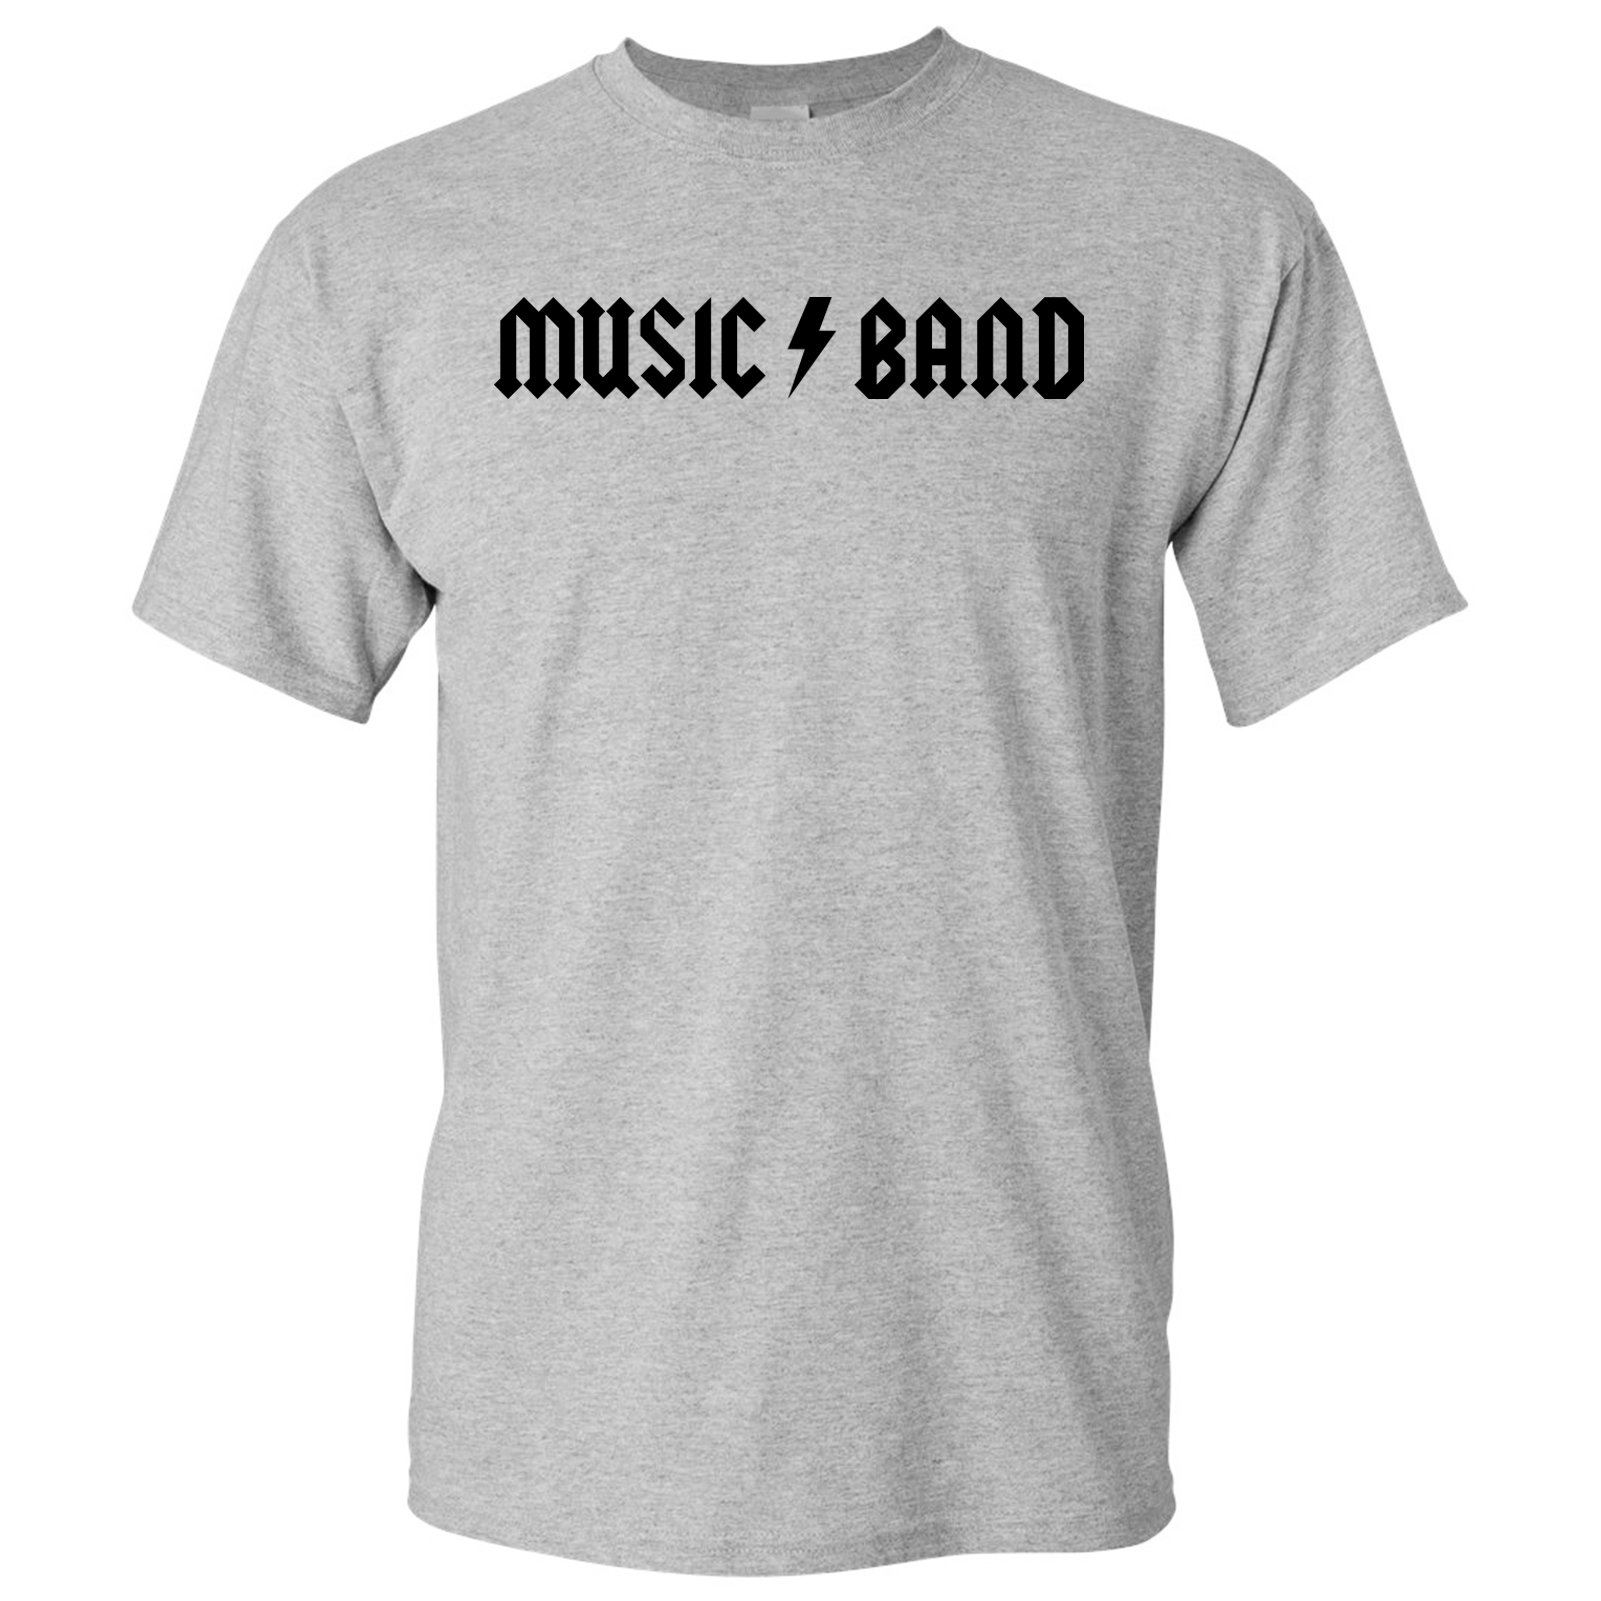 Music Band - Funny Rock Metal Band Parody Fellow Kid Meme T Shirt - Medium - Sport Grey